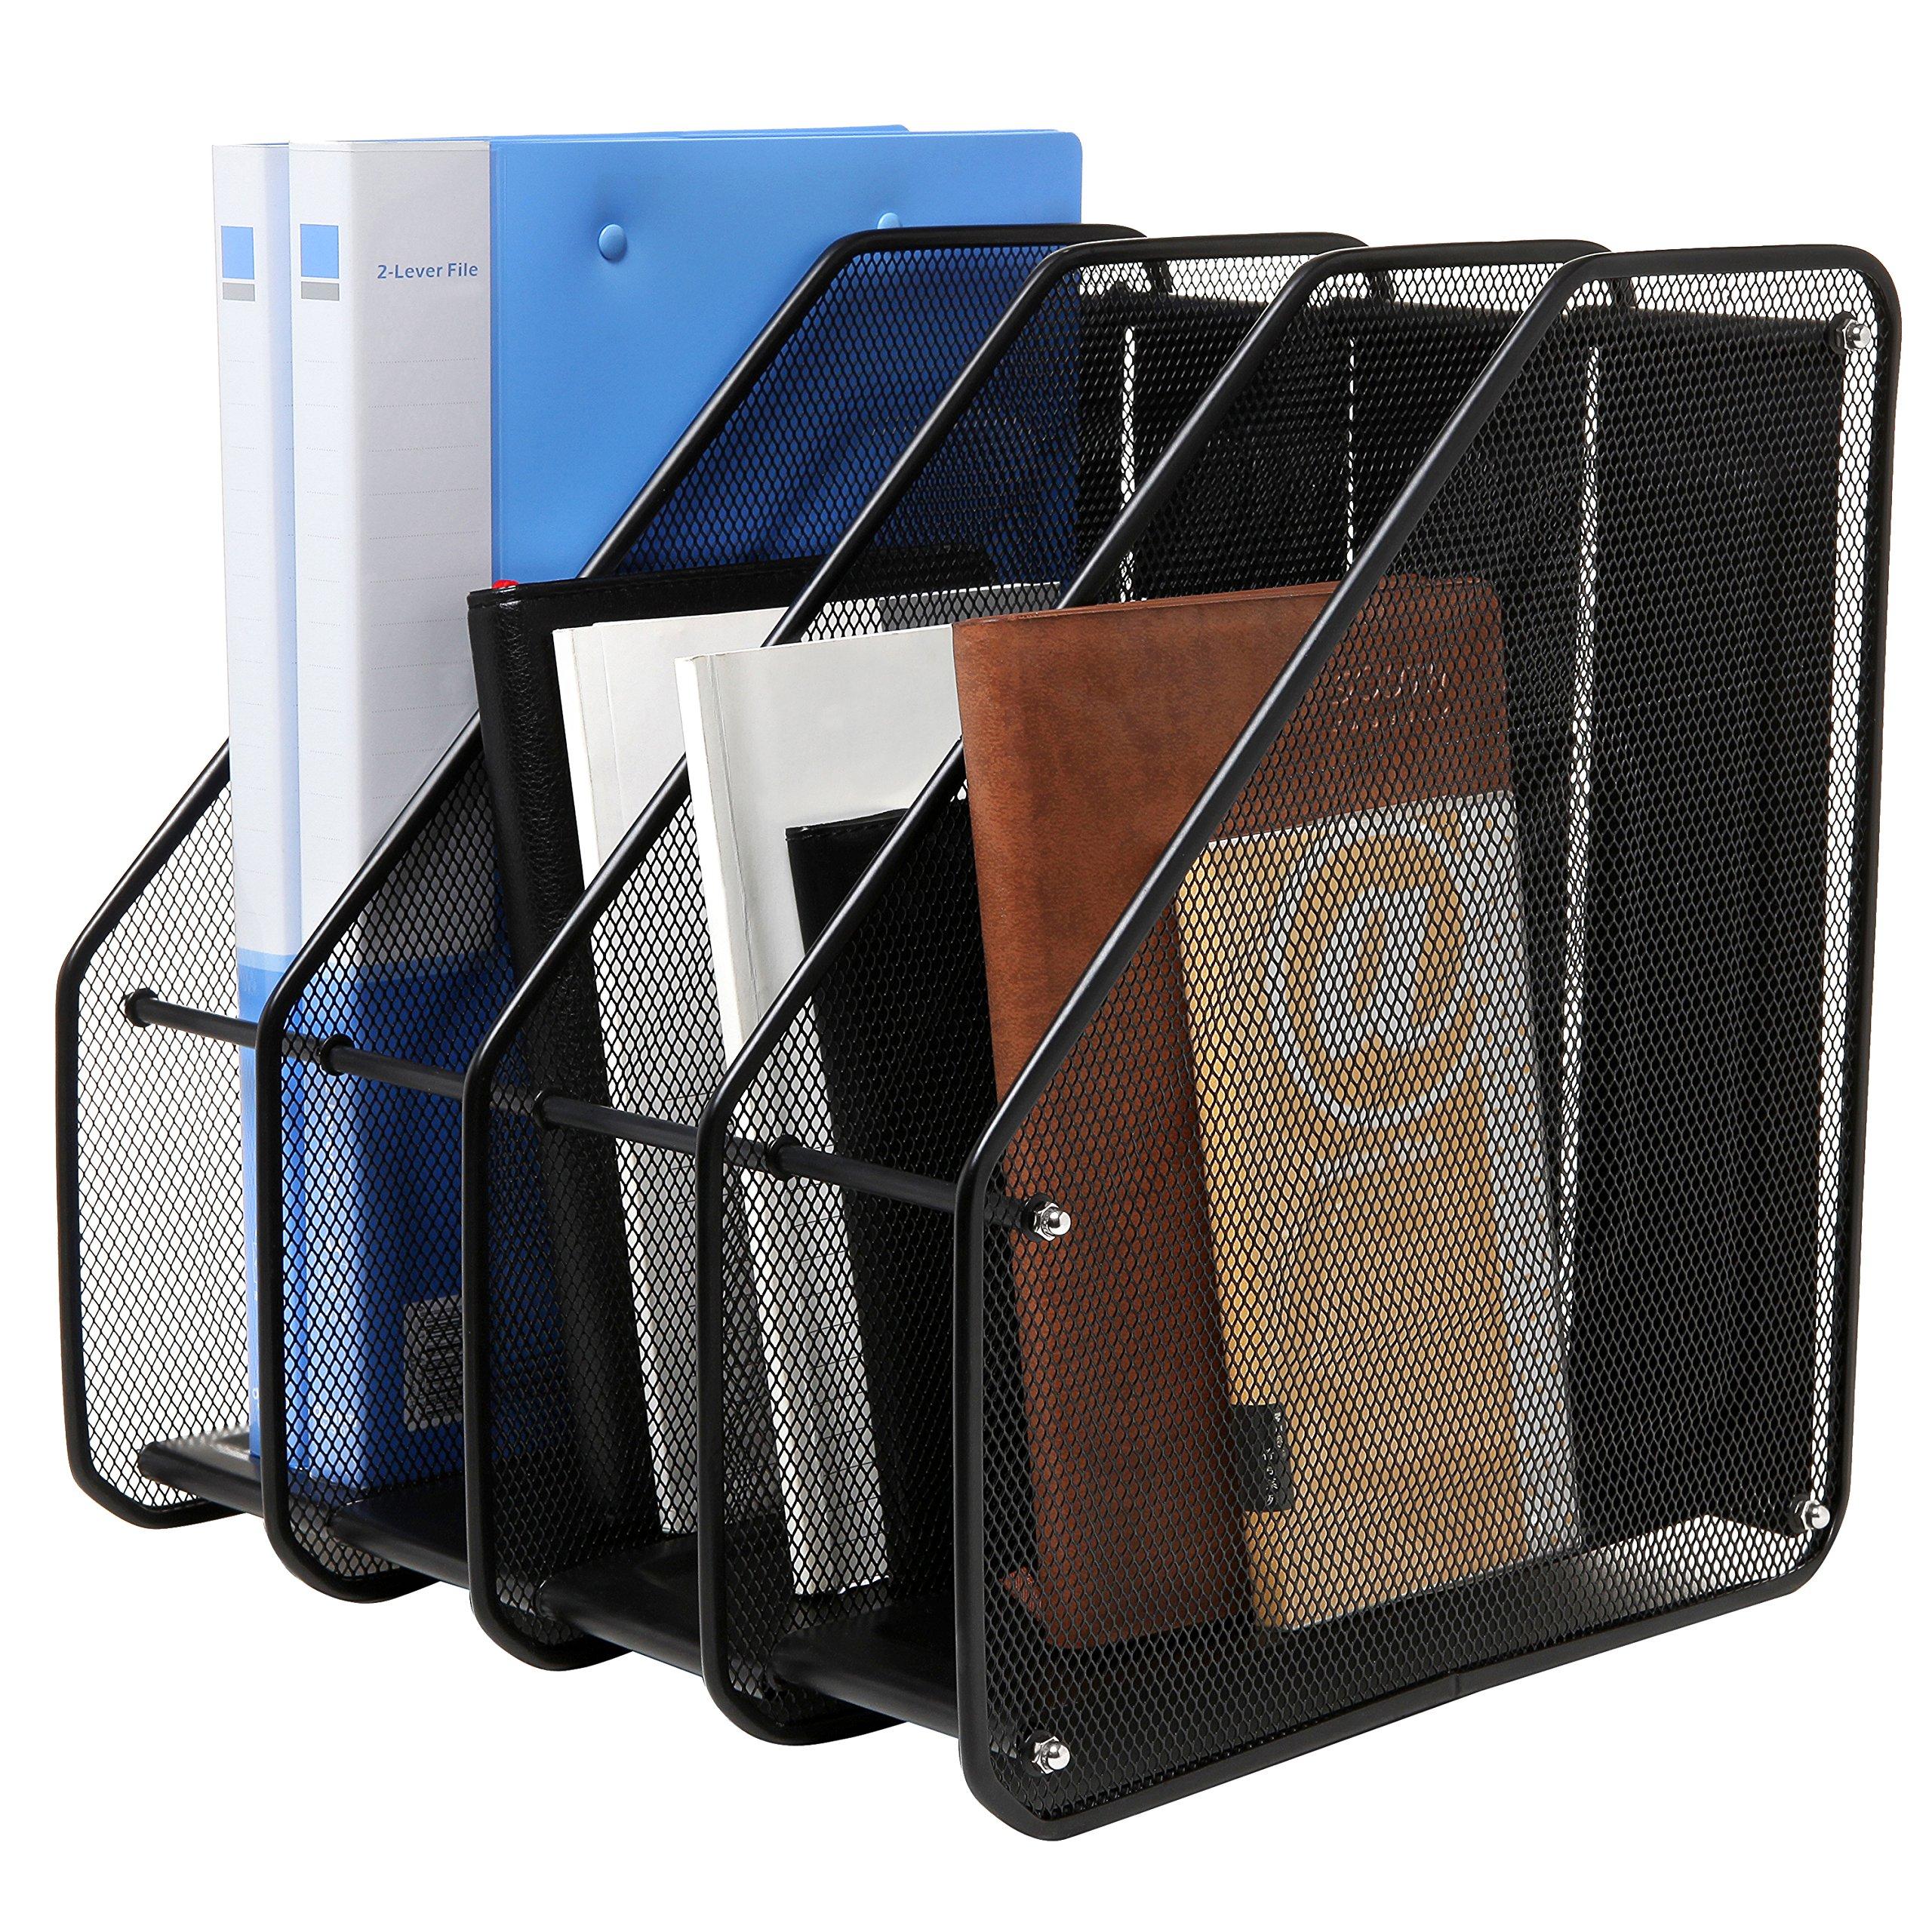 Heavy Duty 4 Compartment Black Metal Mesh Office Desktop Document & File Organizer Rack/Magazine Holder